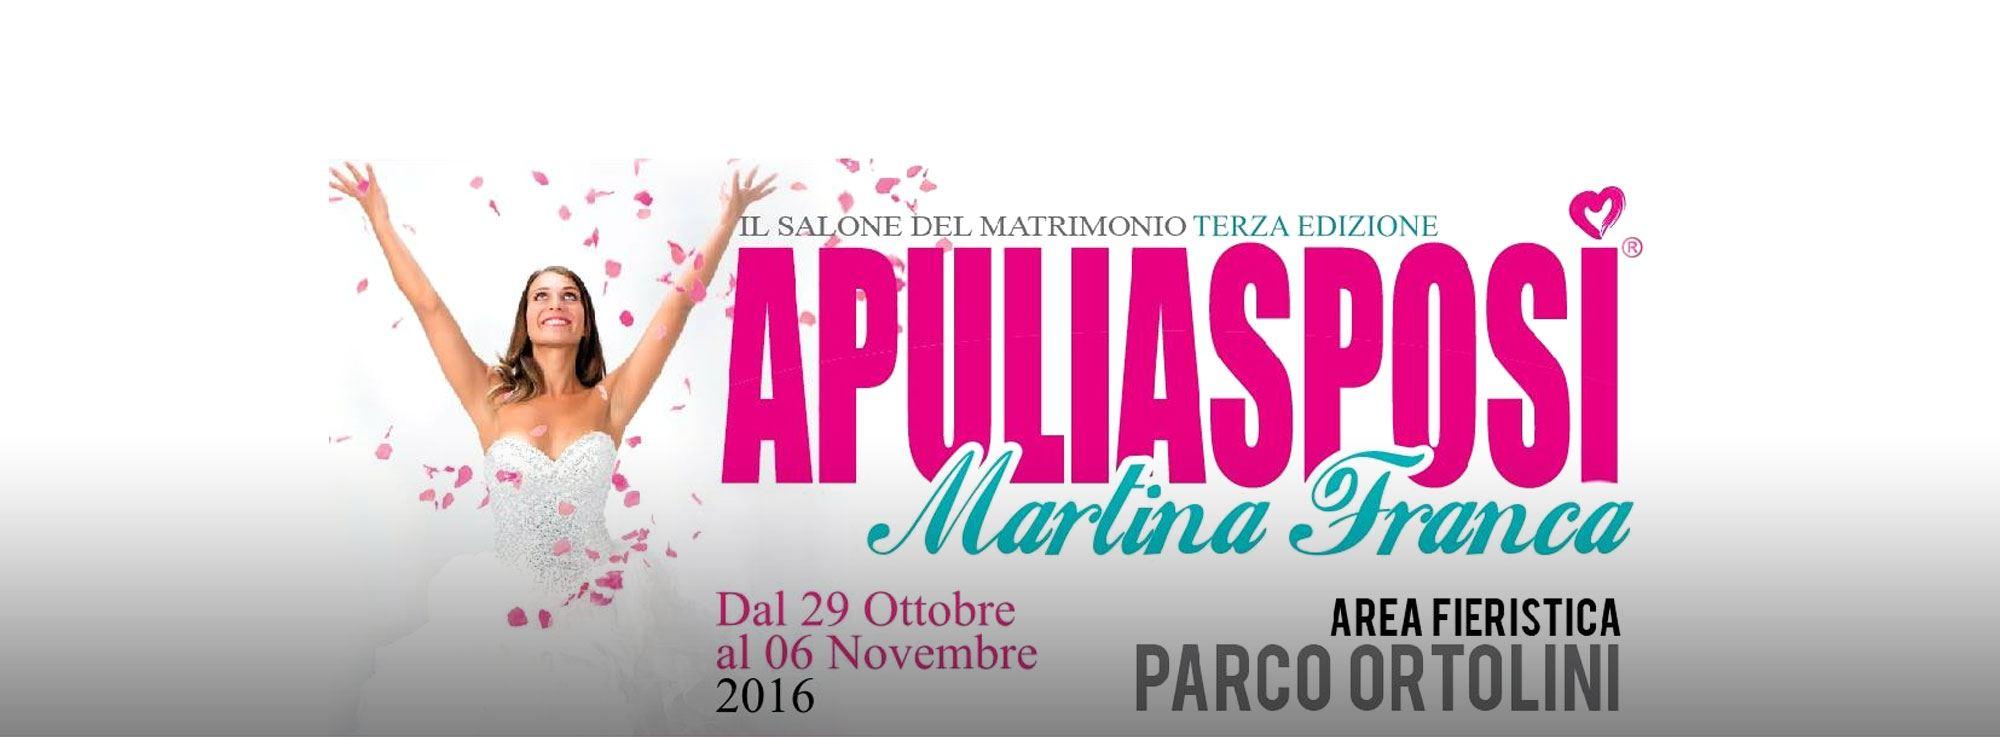 Martina Franca: Apulia Sposi 2016